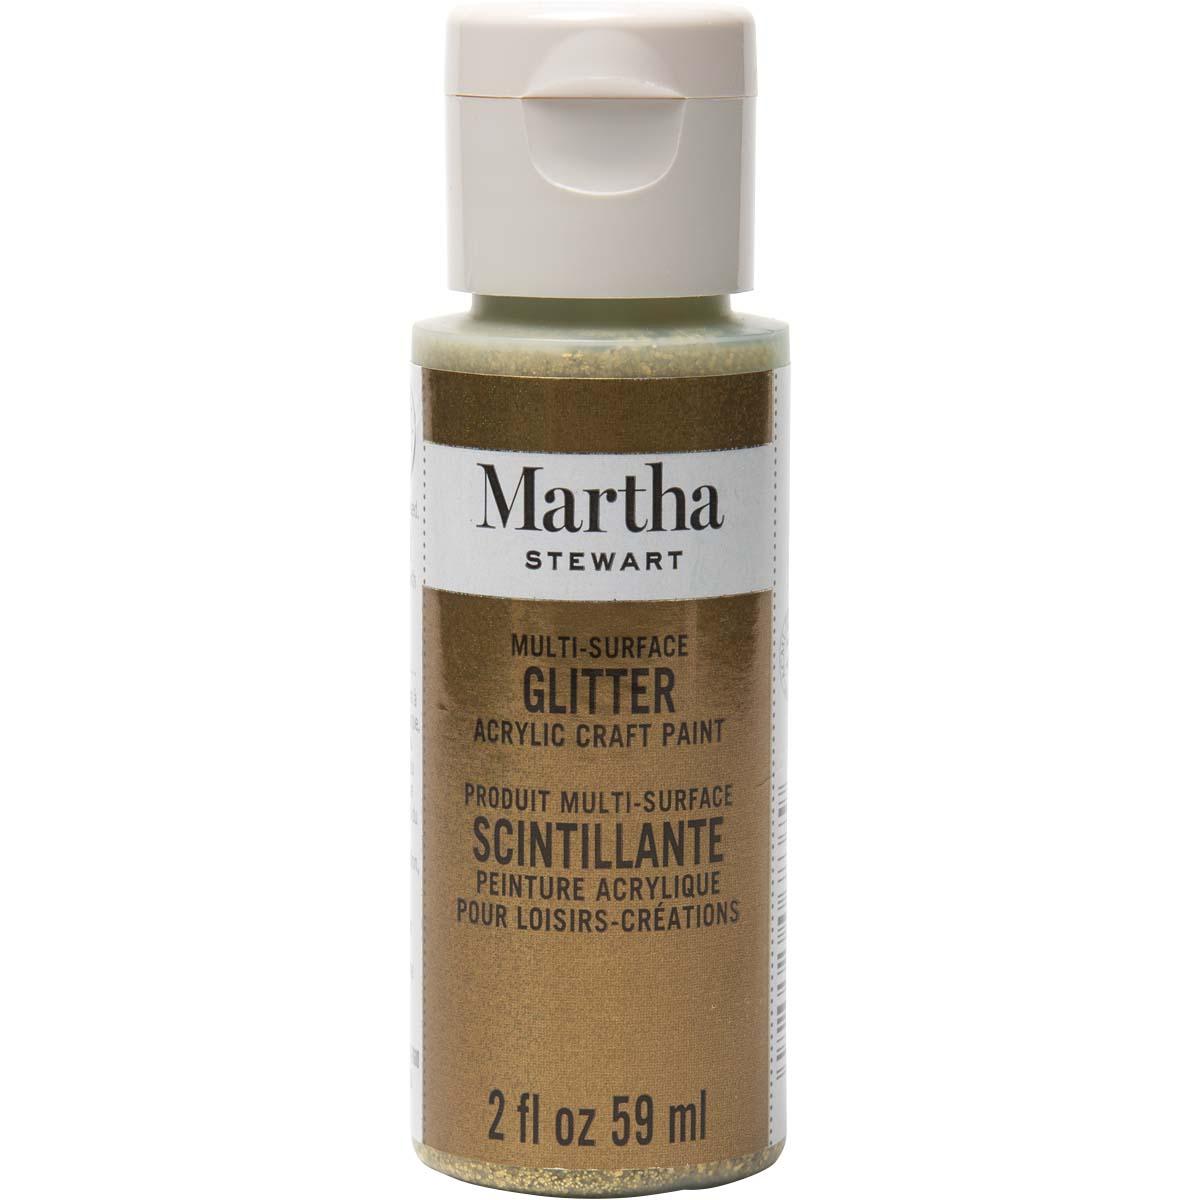 Martha Stewart® 2oz Multi-Surface Glitter Acrylic Craft Paint - Florentine Gold